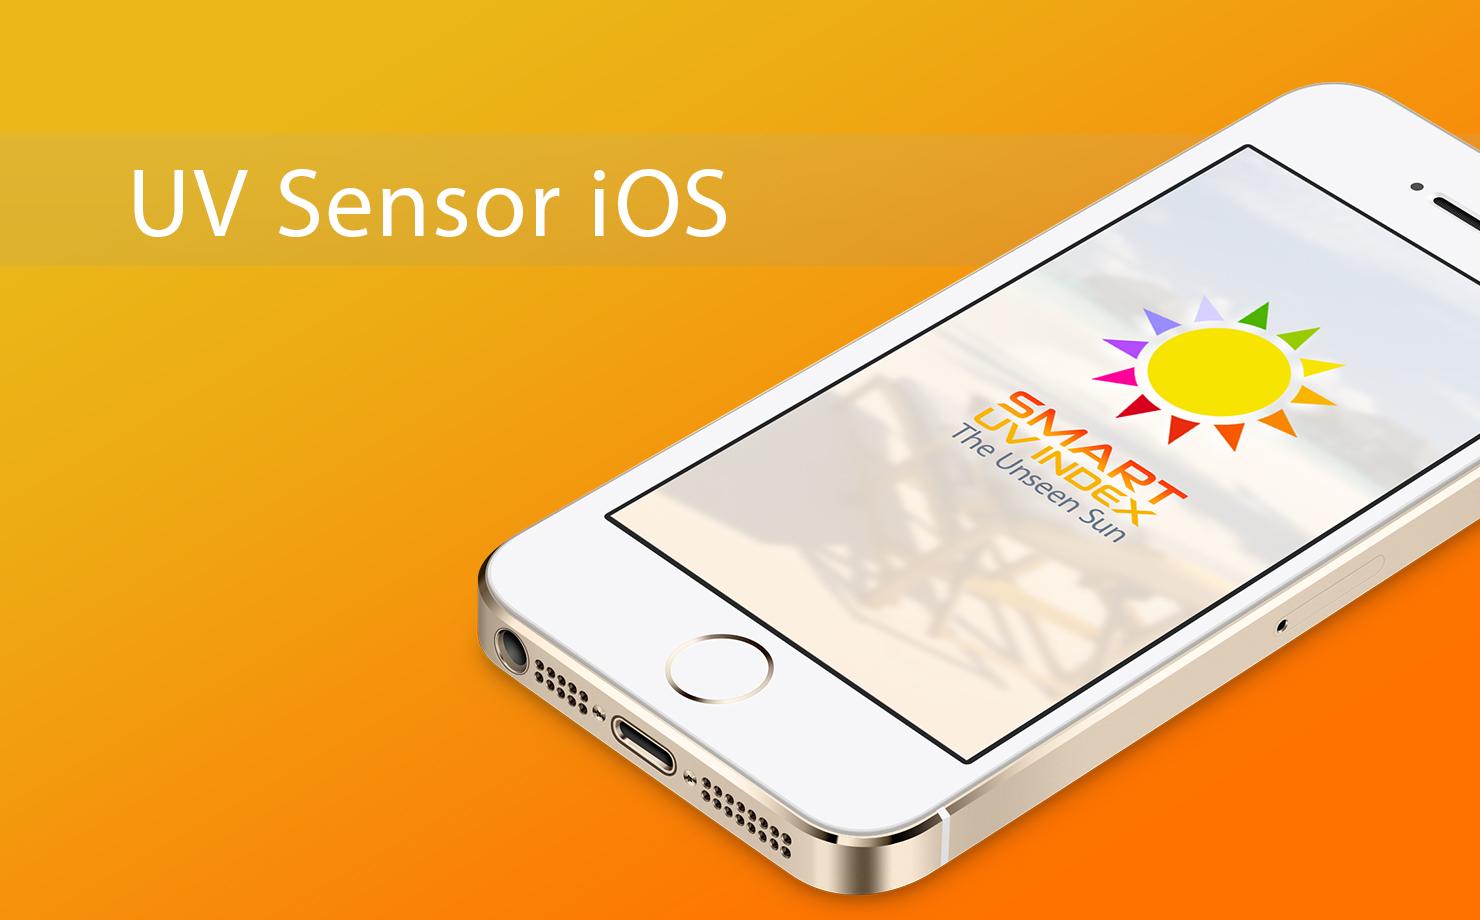 The use of UV sensor